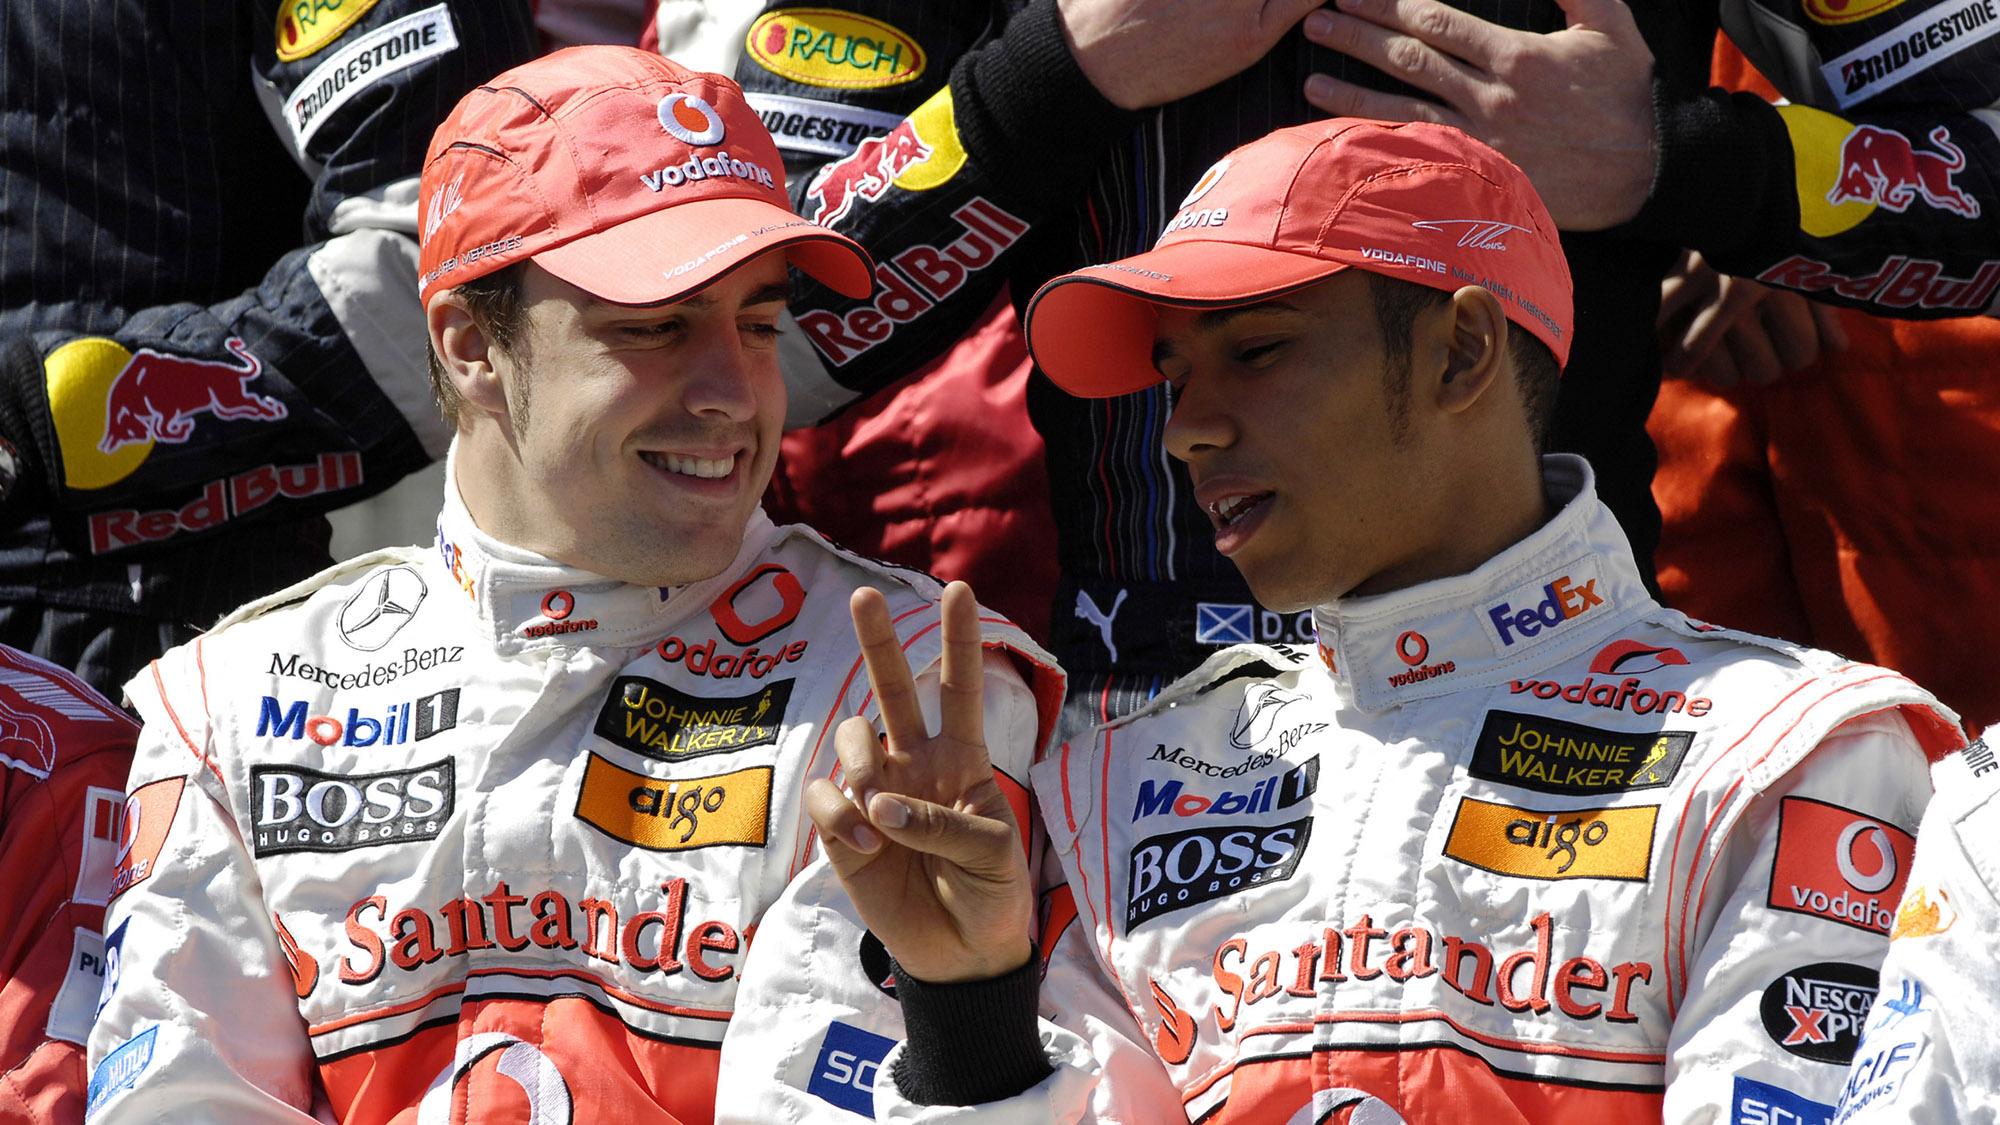 Lewis Hamilton talks to his McLaren team-mate Fernando Alonso